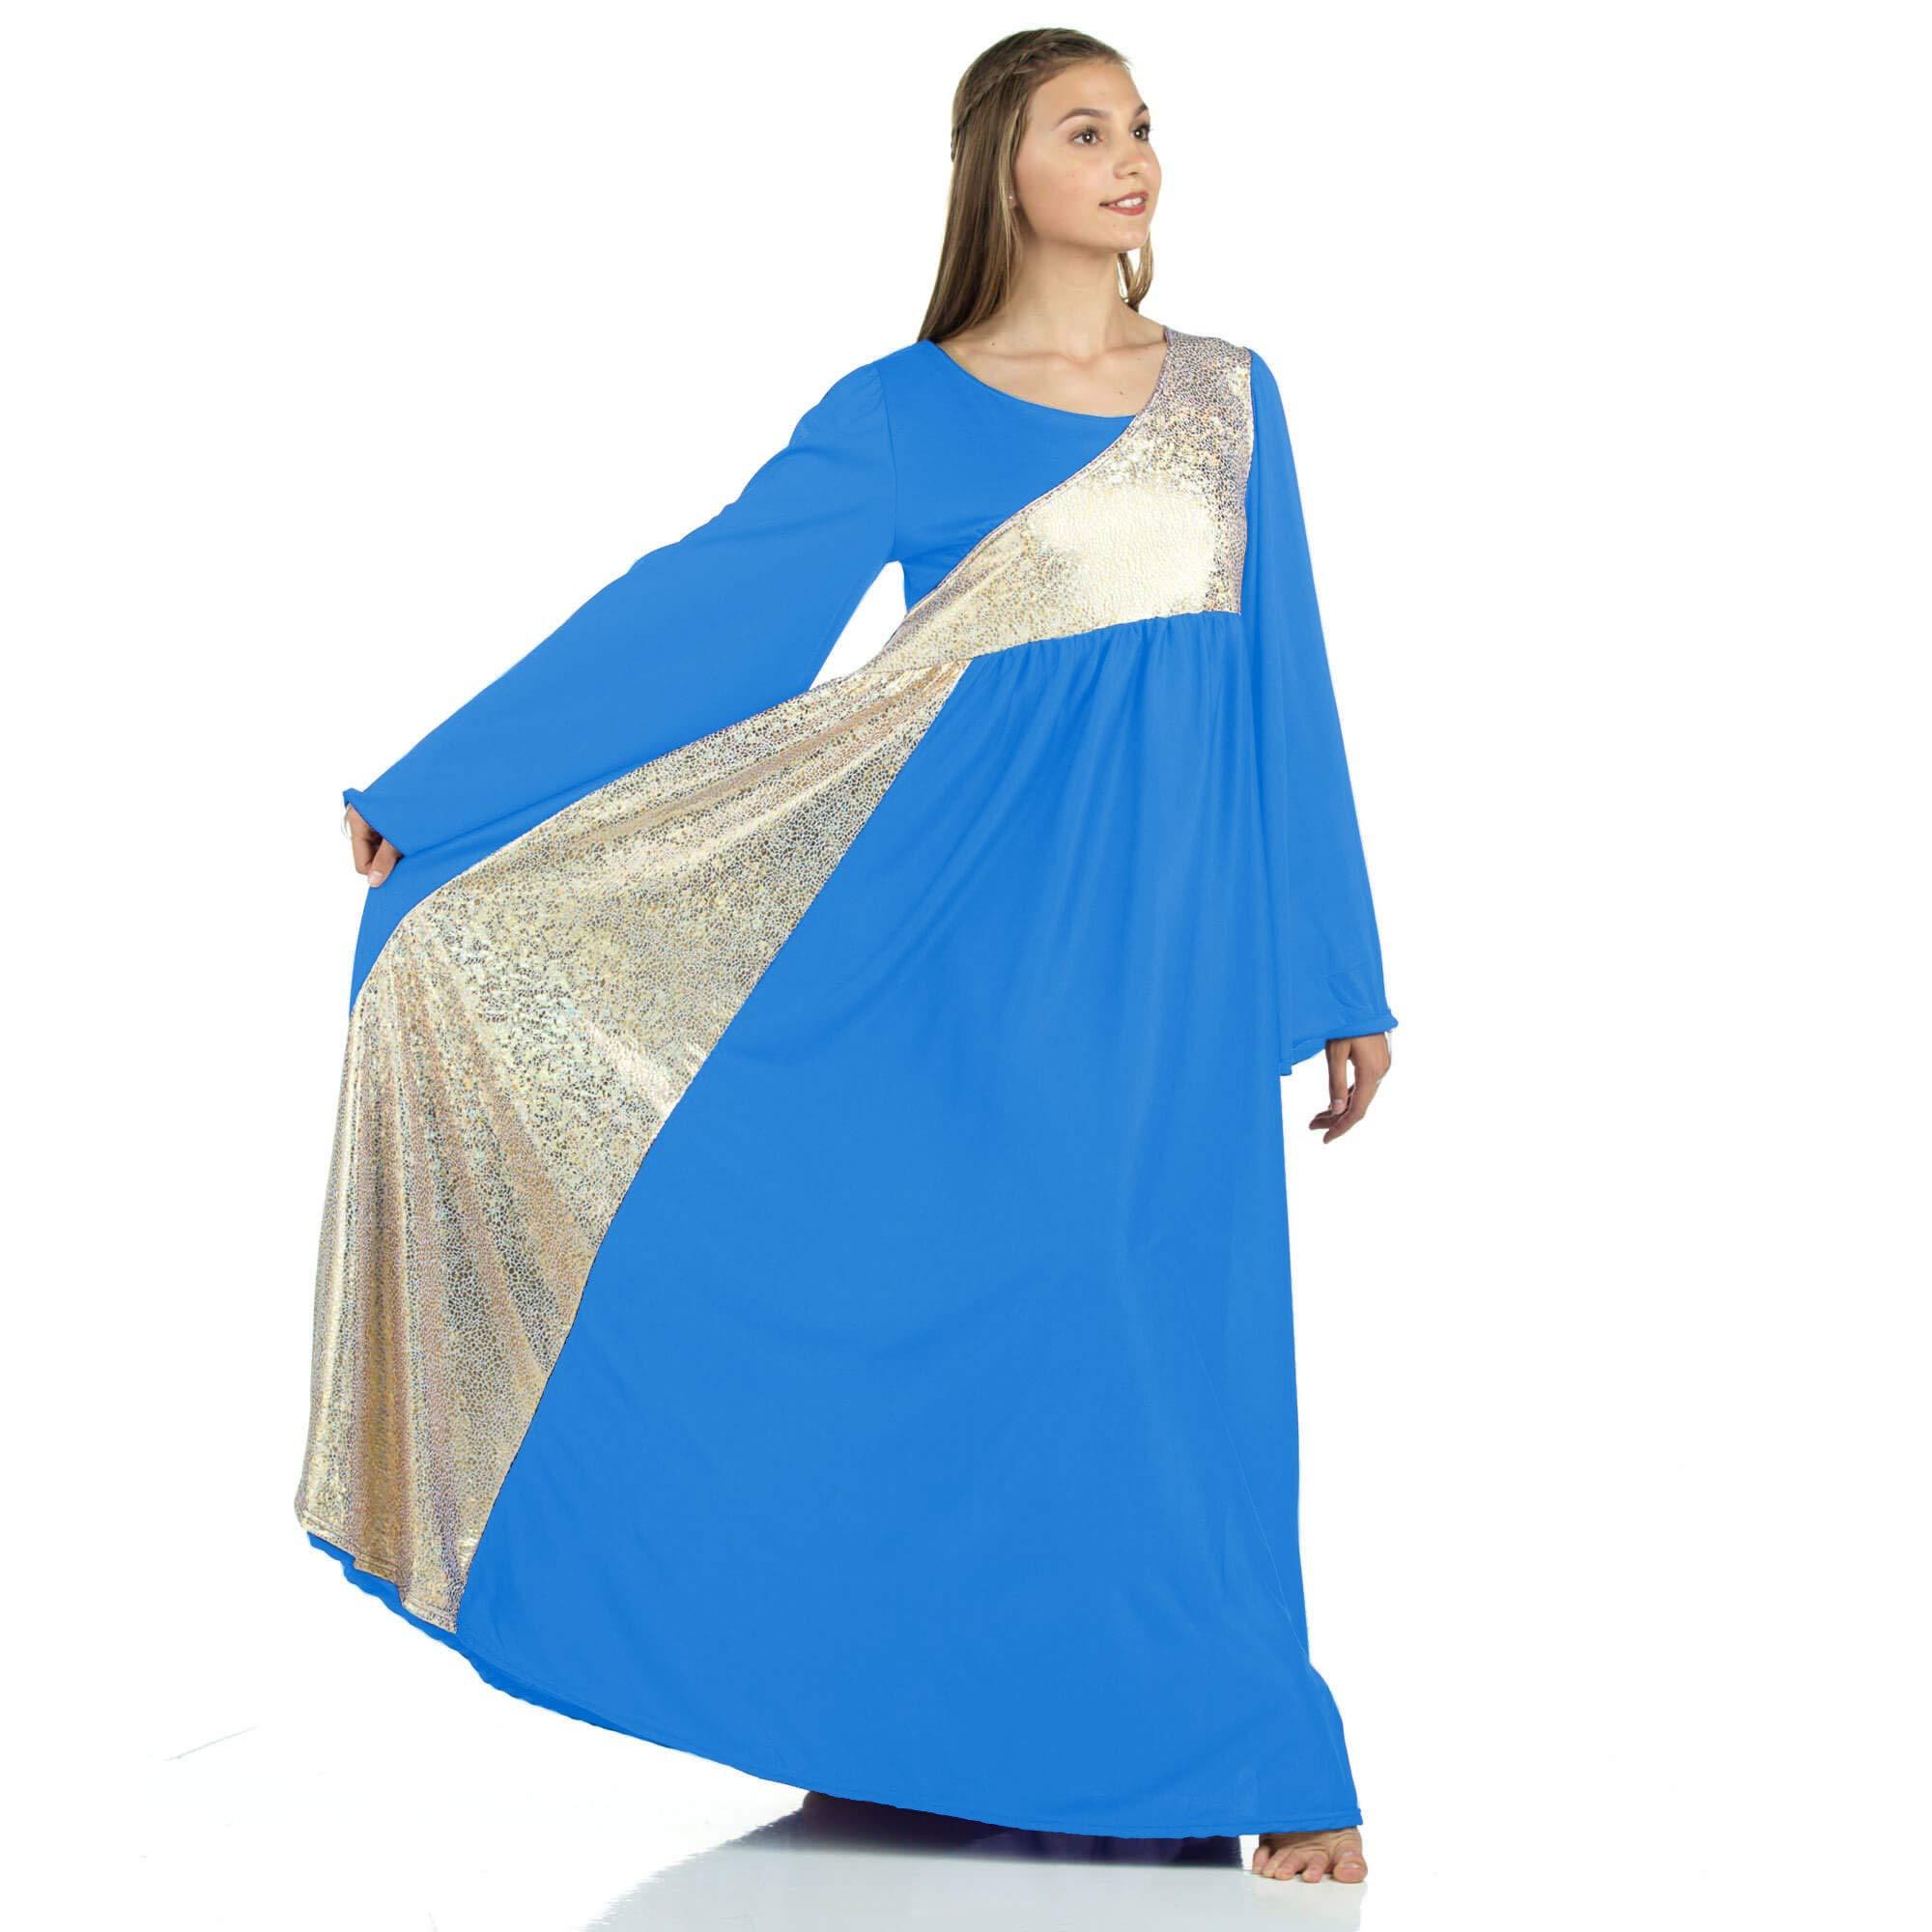 Danzcue Womens Shimmery Asymmetrical Bell Sleeve Dance Dress, Bright Royal-Gold, M by Danzcue